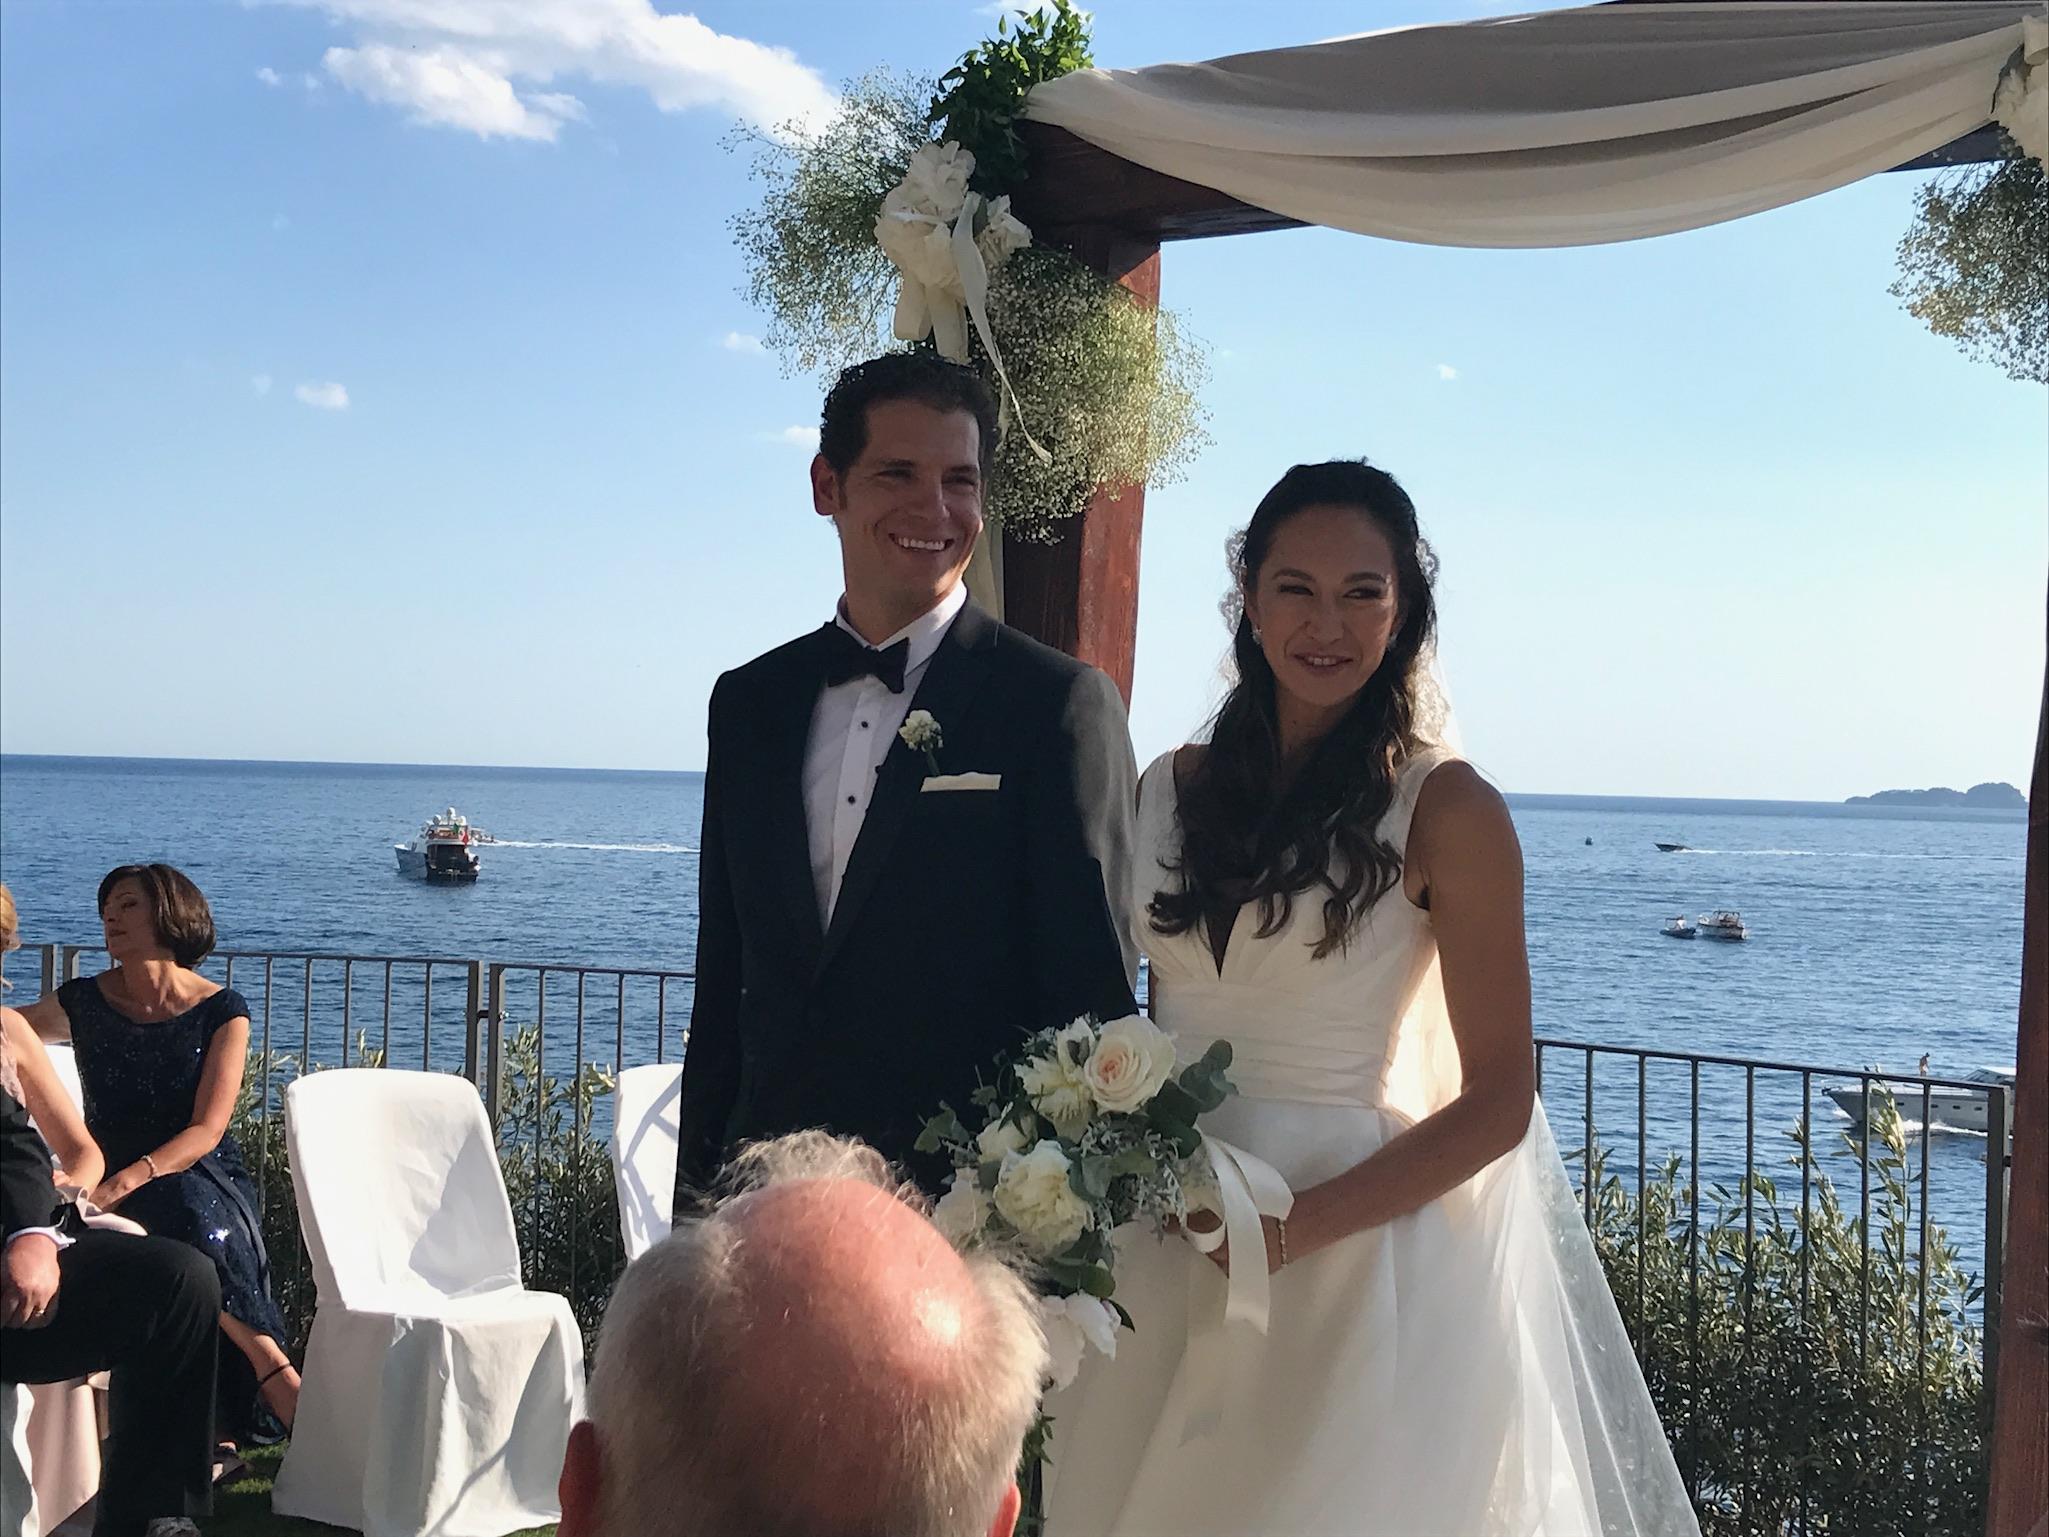 https://www.weddingamalfi.com/wp-content/uploads/Nathalie-and-Benjamin-wedding-in-Positano-16.jpg